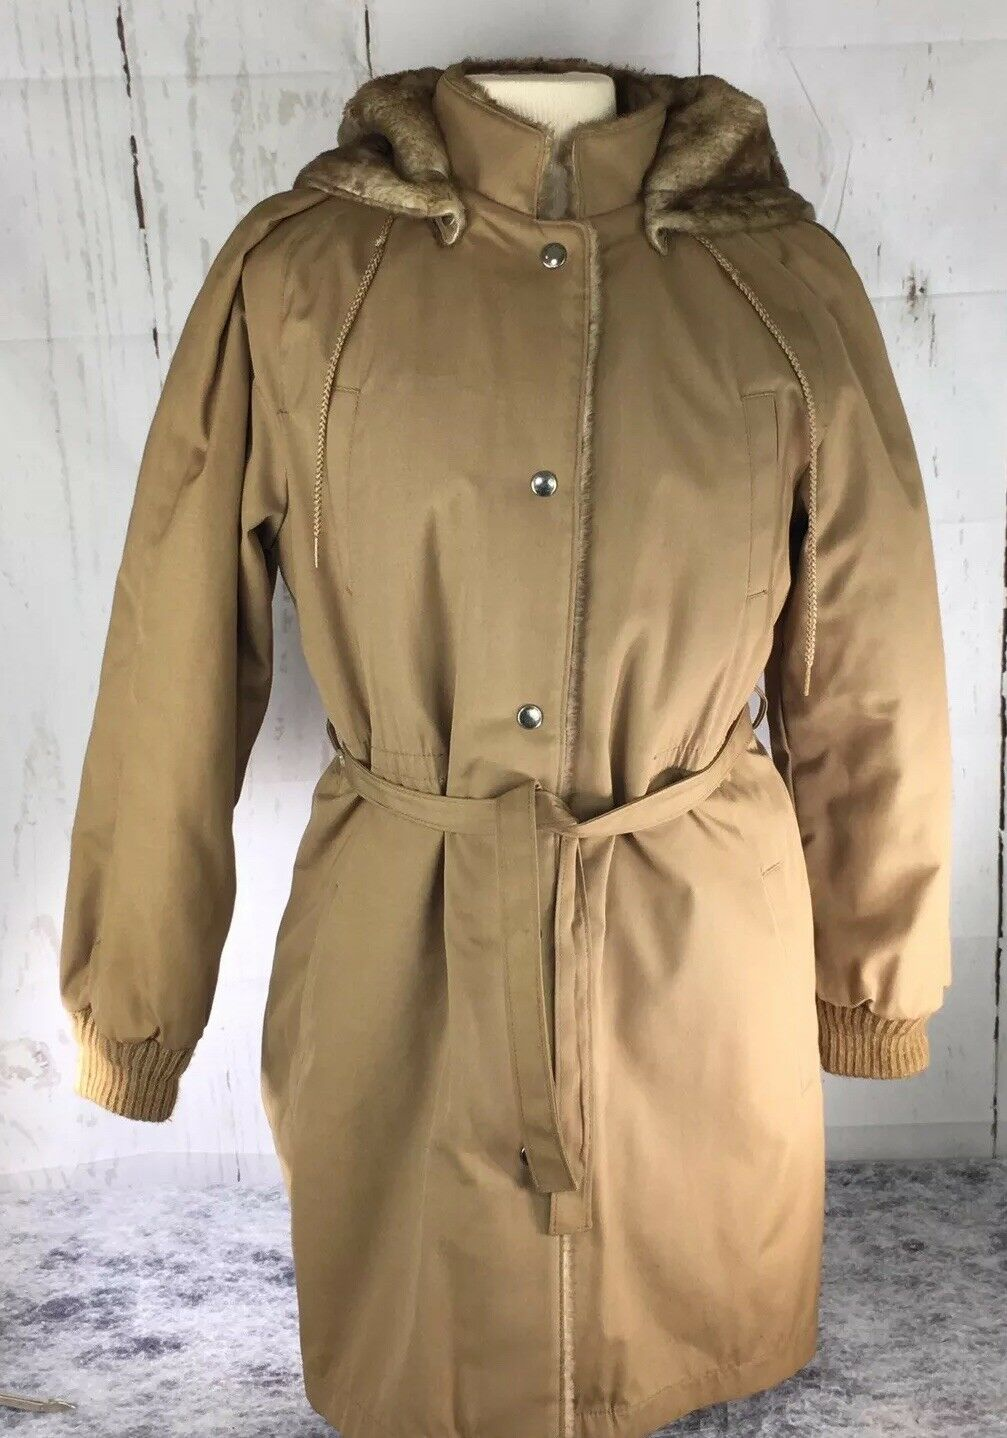 London Fog Women's Size 10 Faux Fur Lined Removable Faux Fur Hood Winter Coat